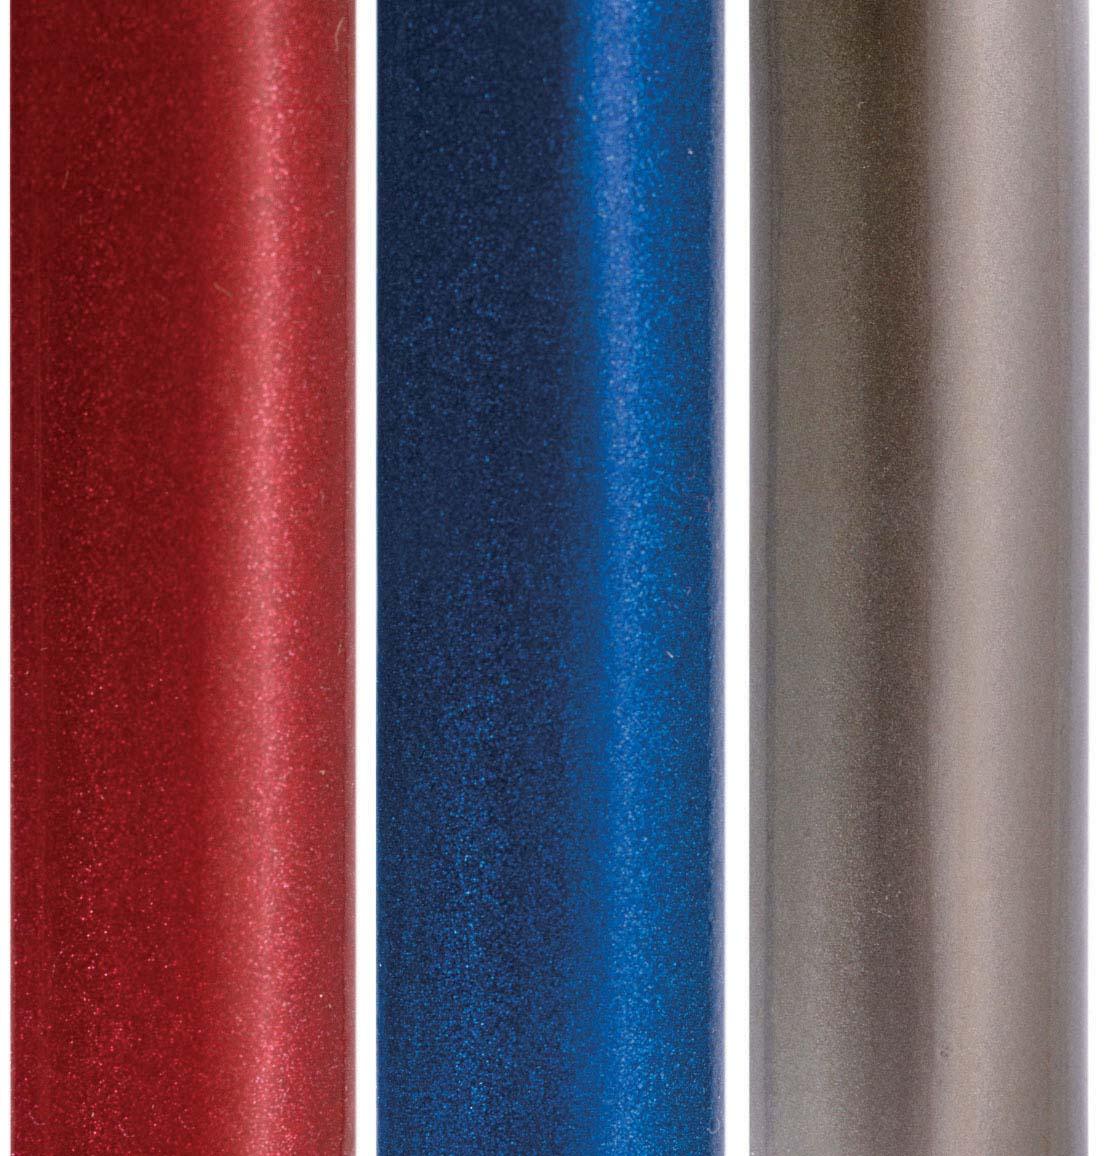 lightweight-extra-wide-heavy-duty-aluminum-rollator-burgundy-501-1029-0700-lr-2.jpg